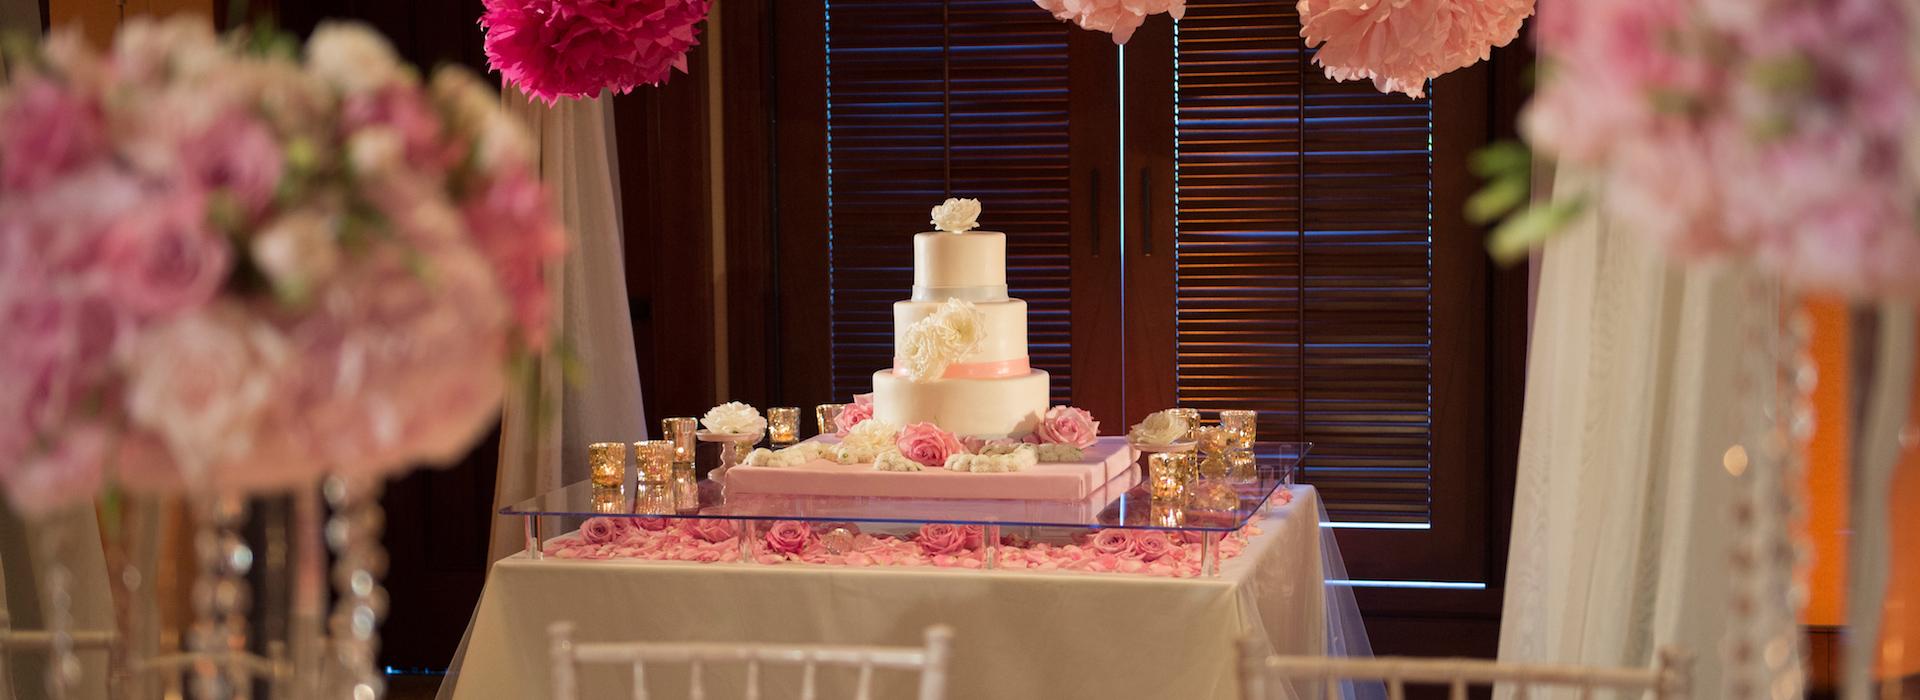 Quality Wedding Cakes Chattanooga Tn Cake Supplies 4238552051